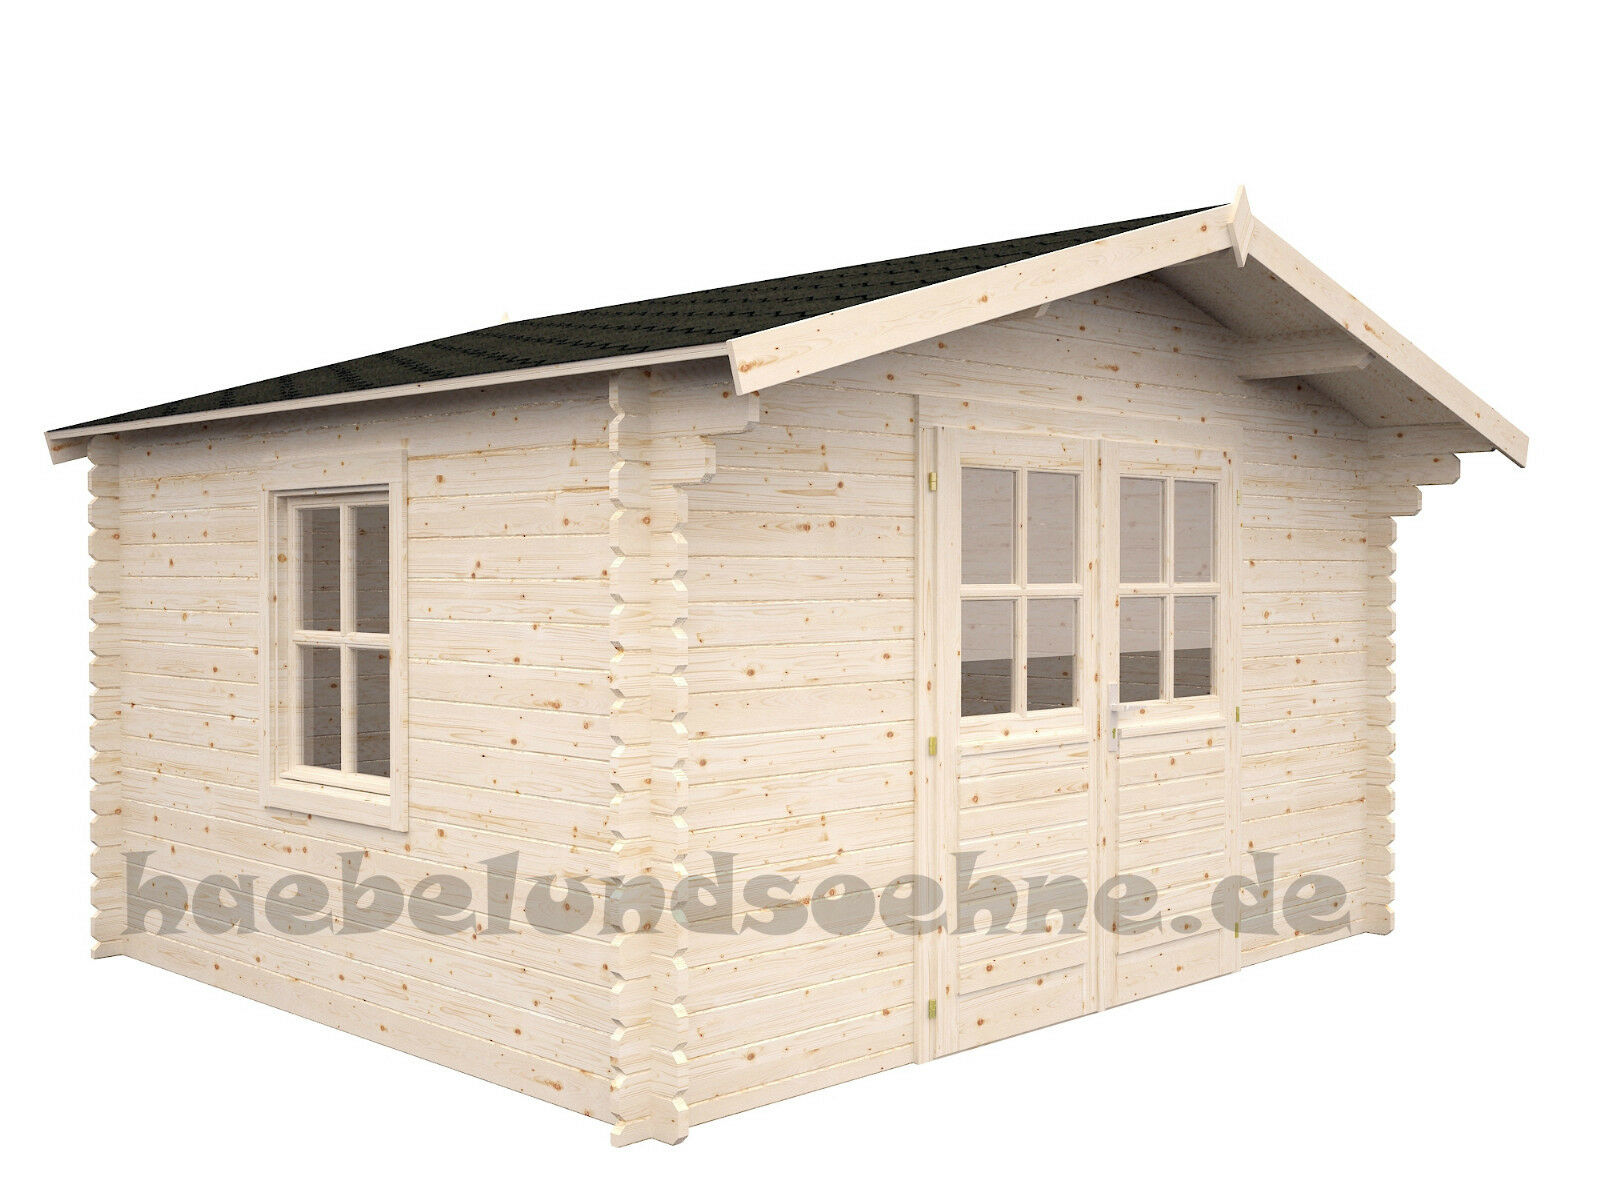 gartenhaus sandy 4 2 anbauschuppen 380x320 cm ger tehaus holz qualit t 34mm 4743142008812 ebay. Black Bedroom Furniture Sets. Home Design Ideas